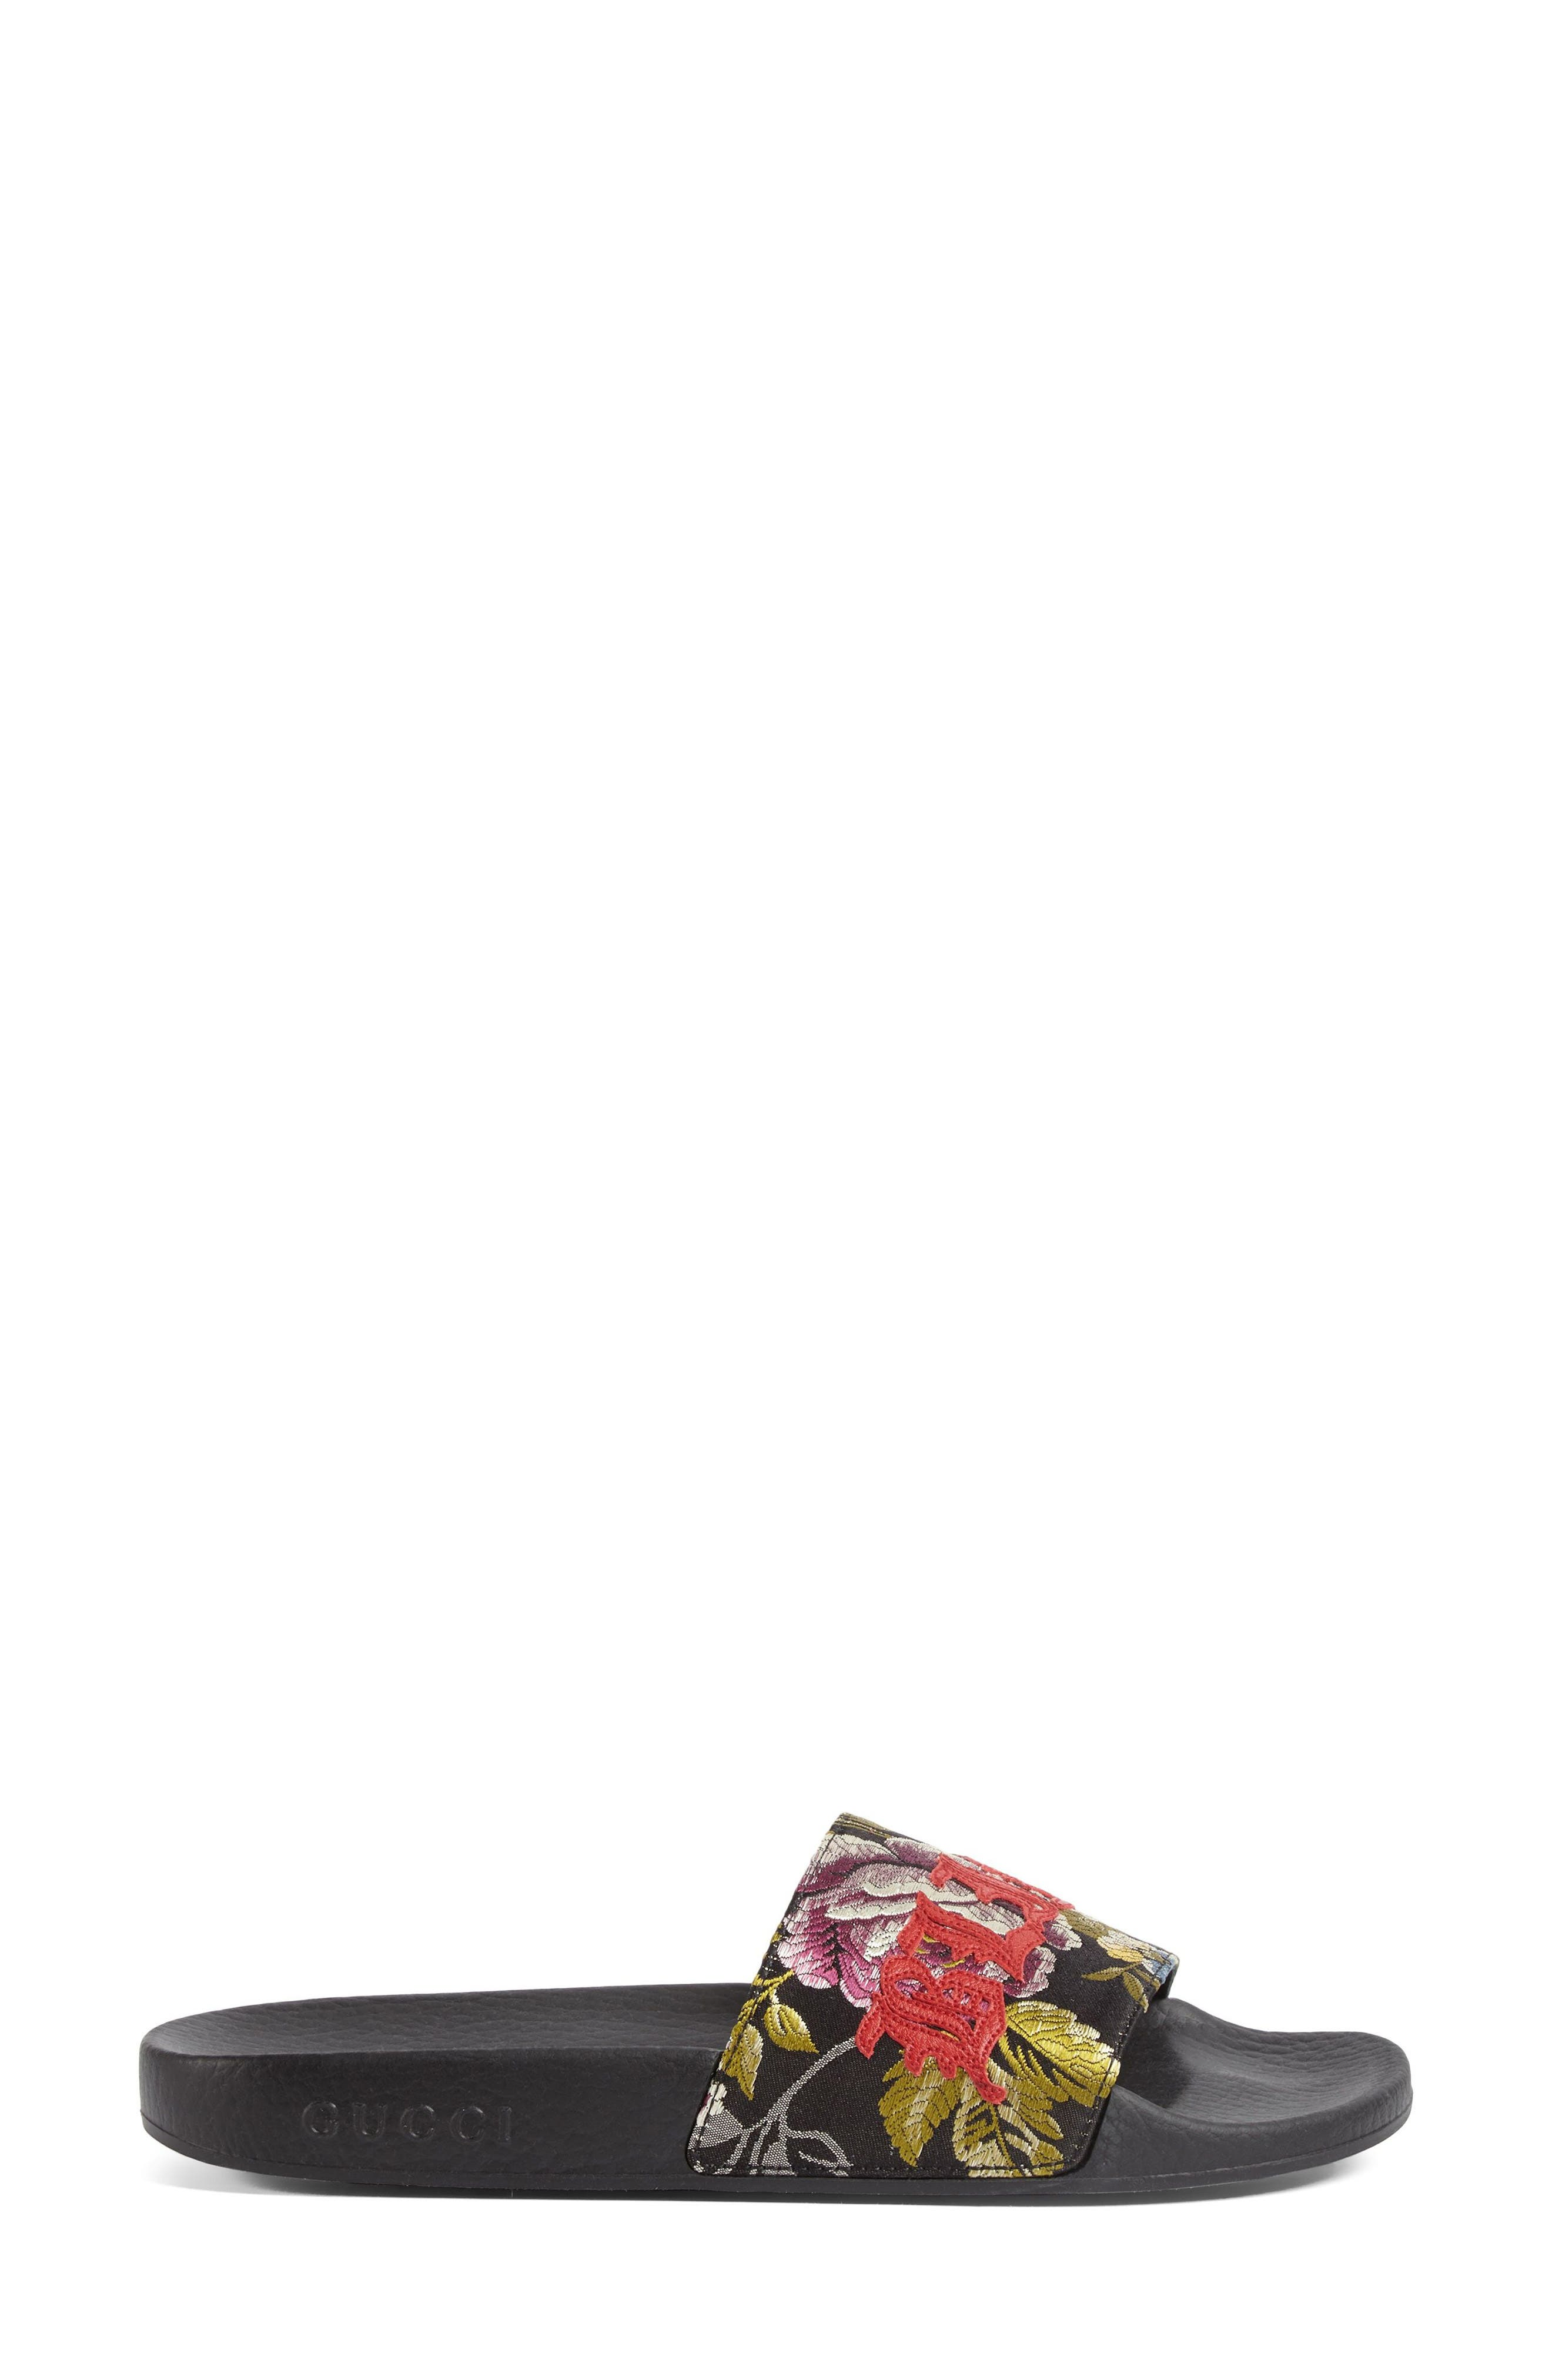 Main Image - Gucci Pursuit Blind for Love Slide Sandal (Women)